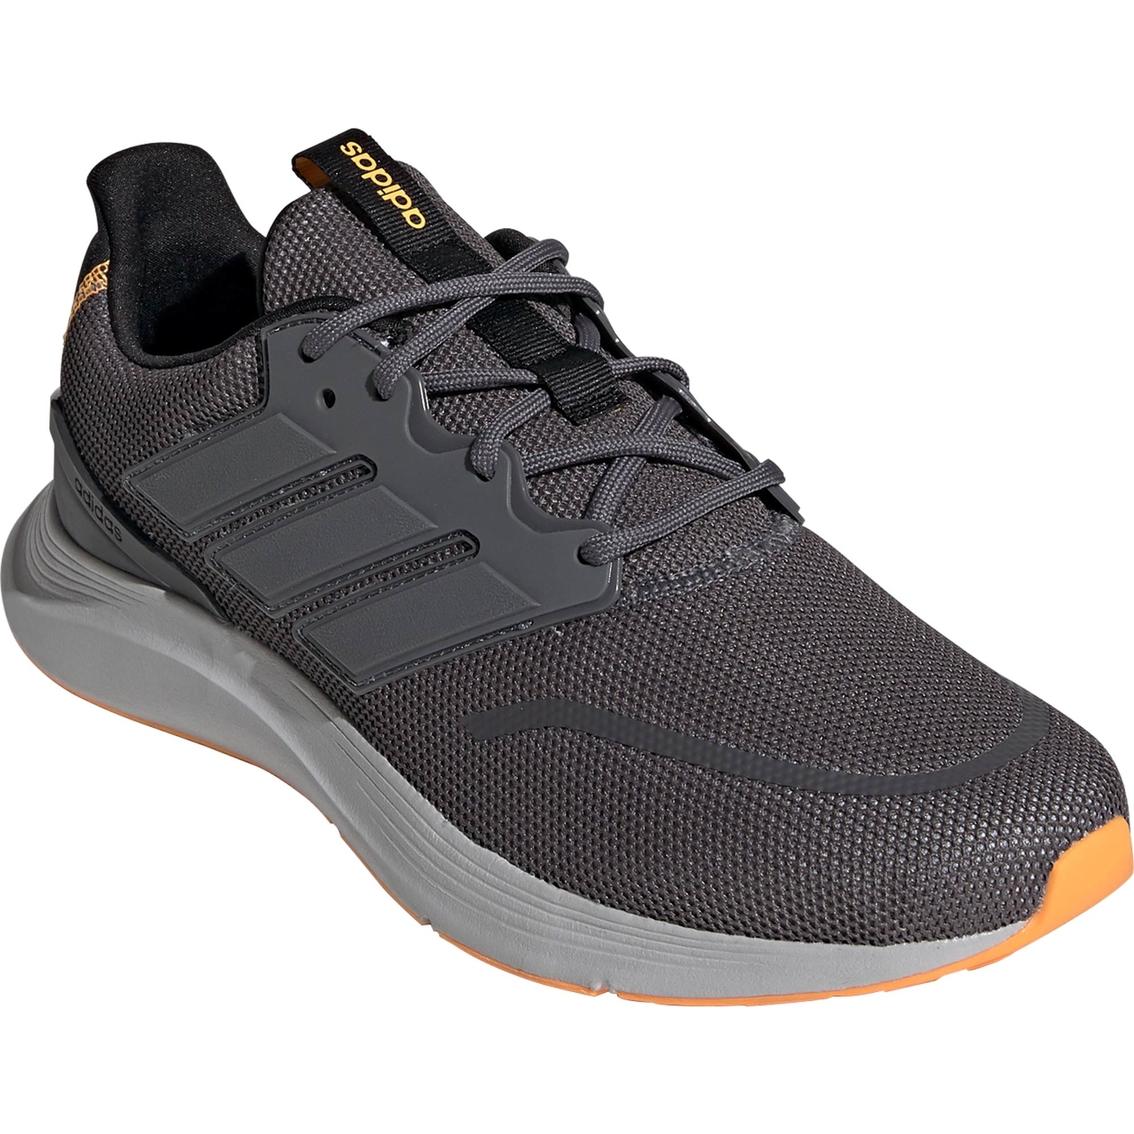 Adidas Men's Energy Falcon Running